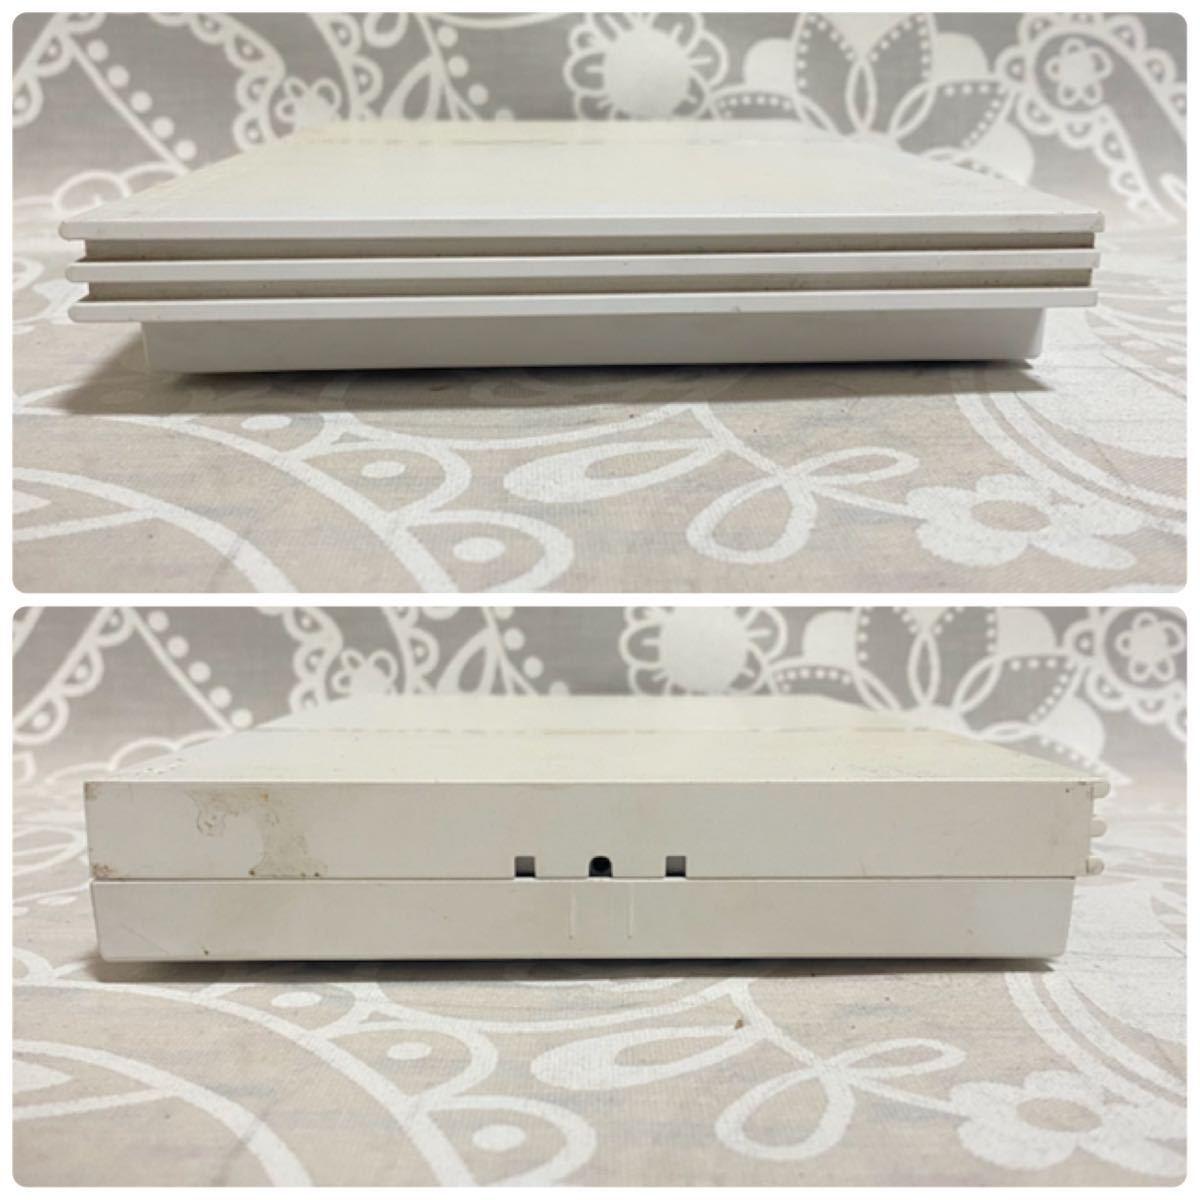 F 【動作品】 PS2 SCPH-75000 ホワイト SONY PlayStation2 プレステ2 プレイステーション 薄型 70000 77000 79000 90000 【本体のみ】